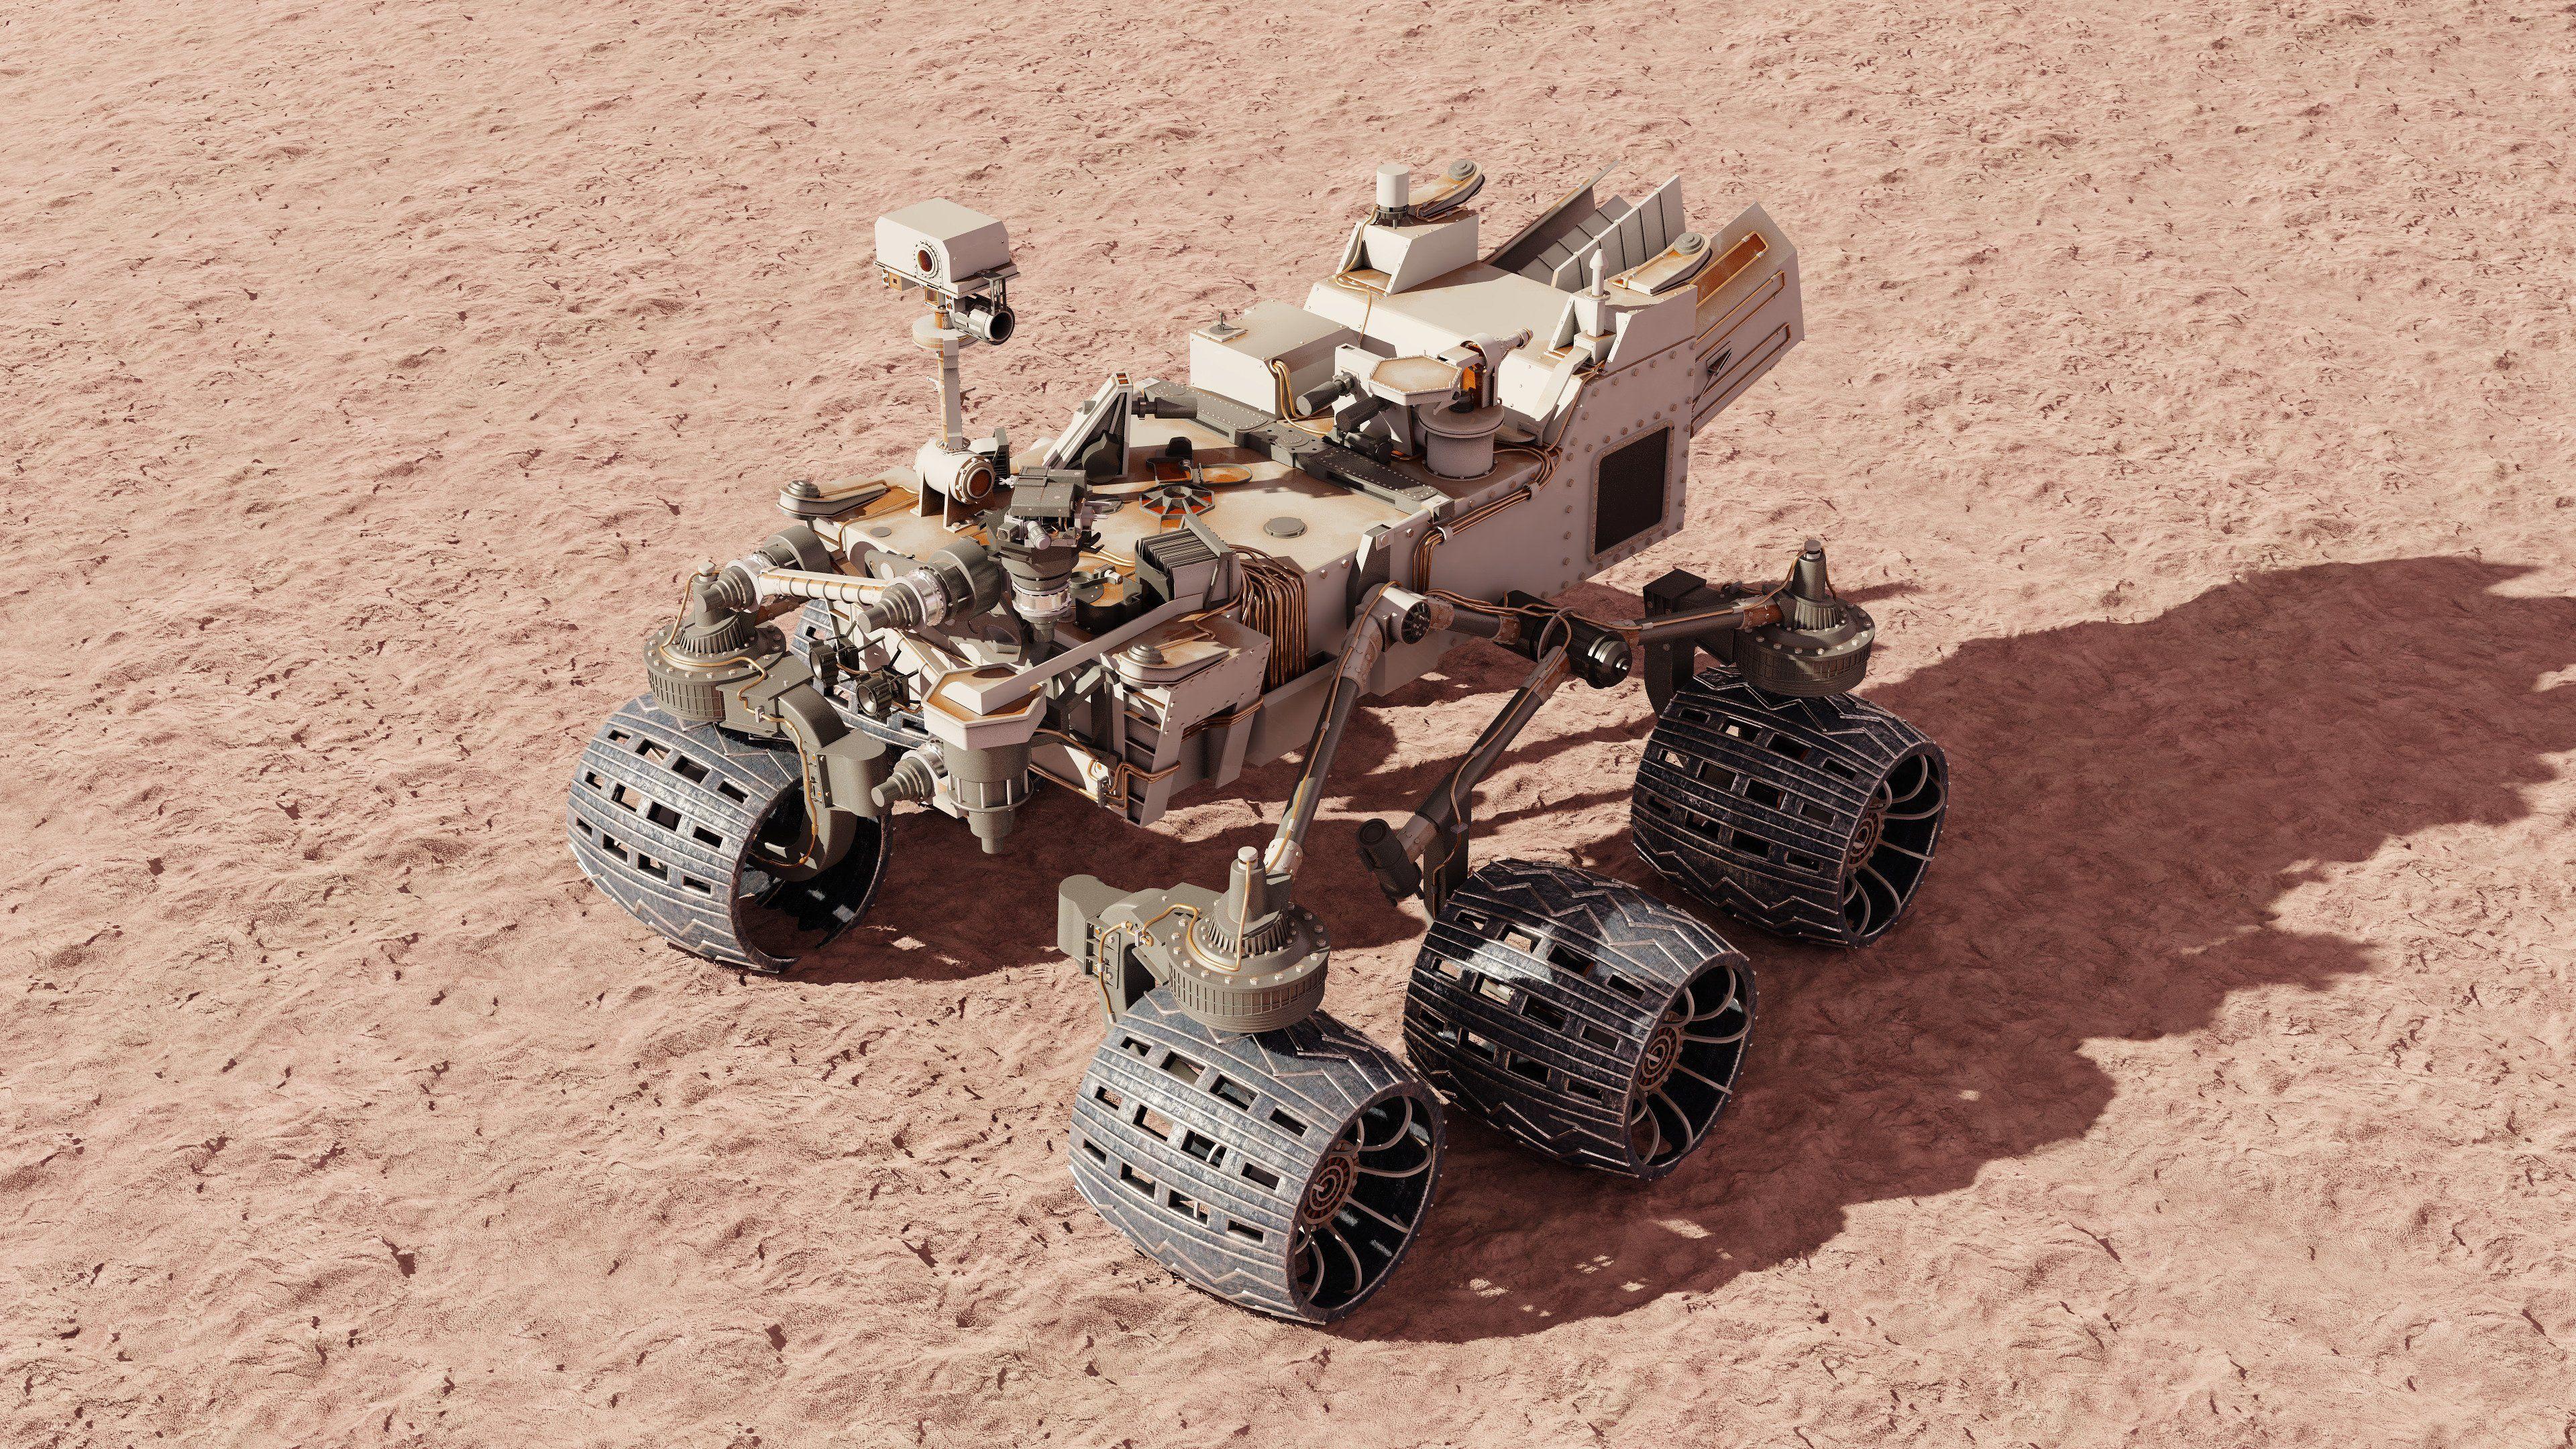 Curiosity Rover Mars 3d Model Vray Curiosity Rover 3d Model Mars Rover